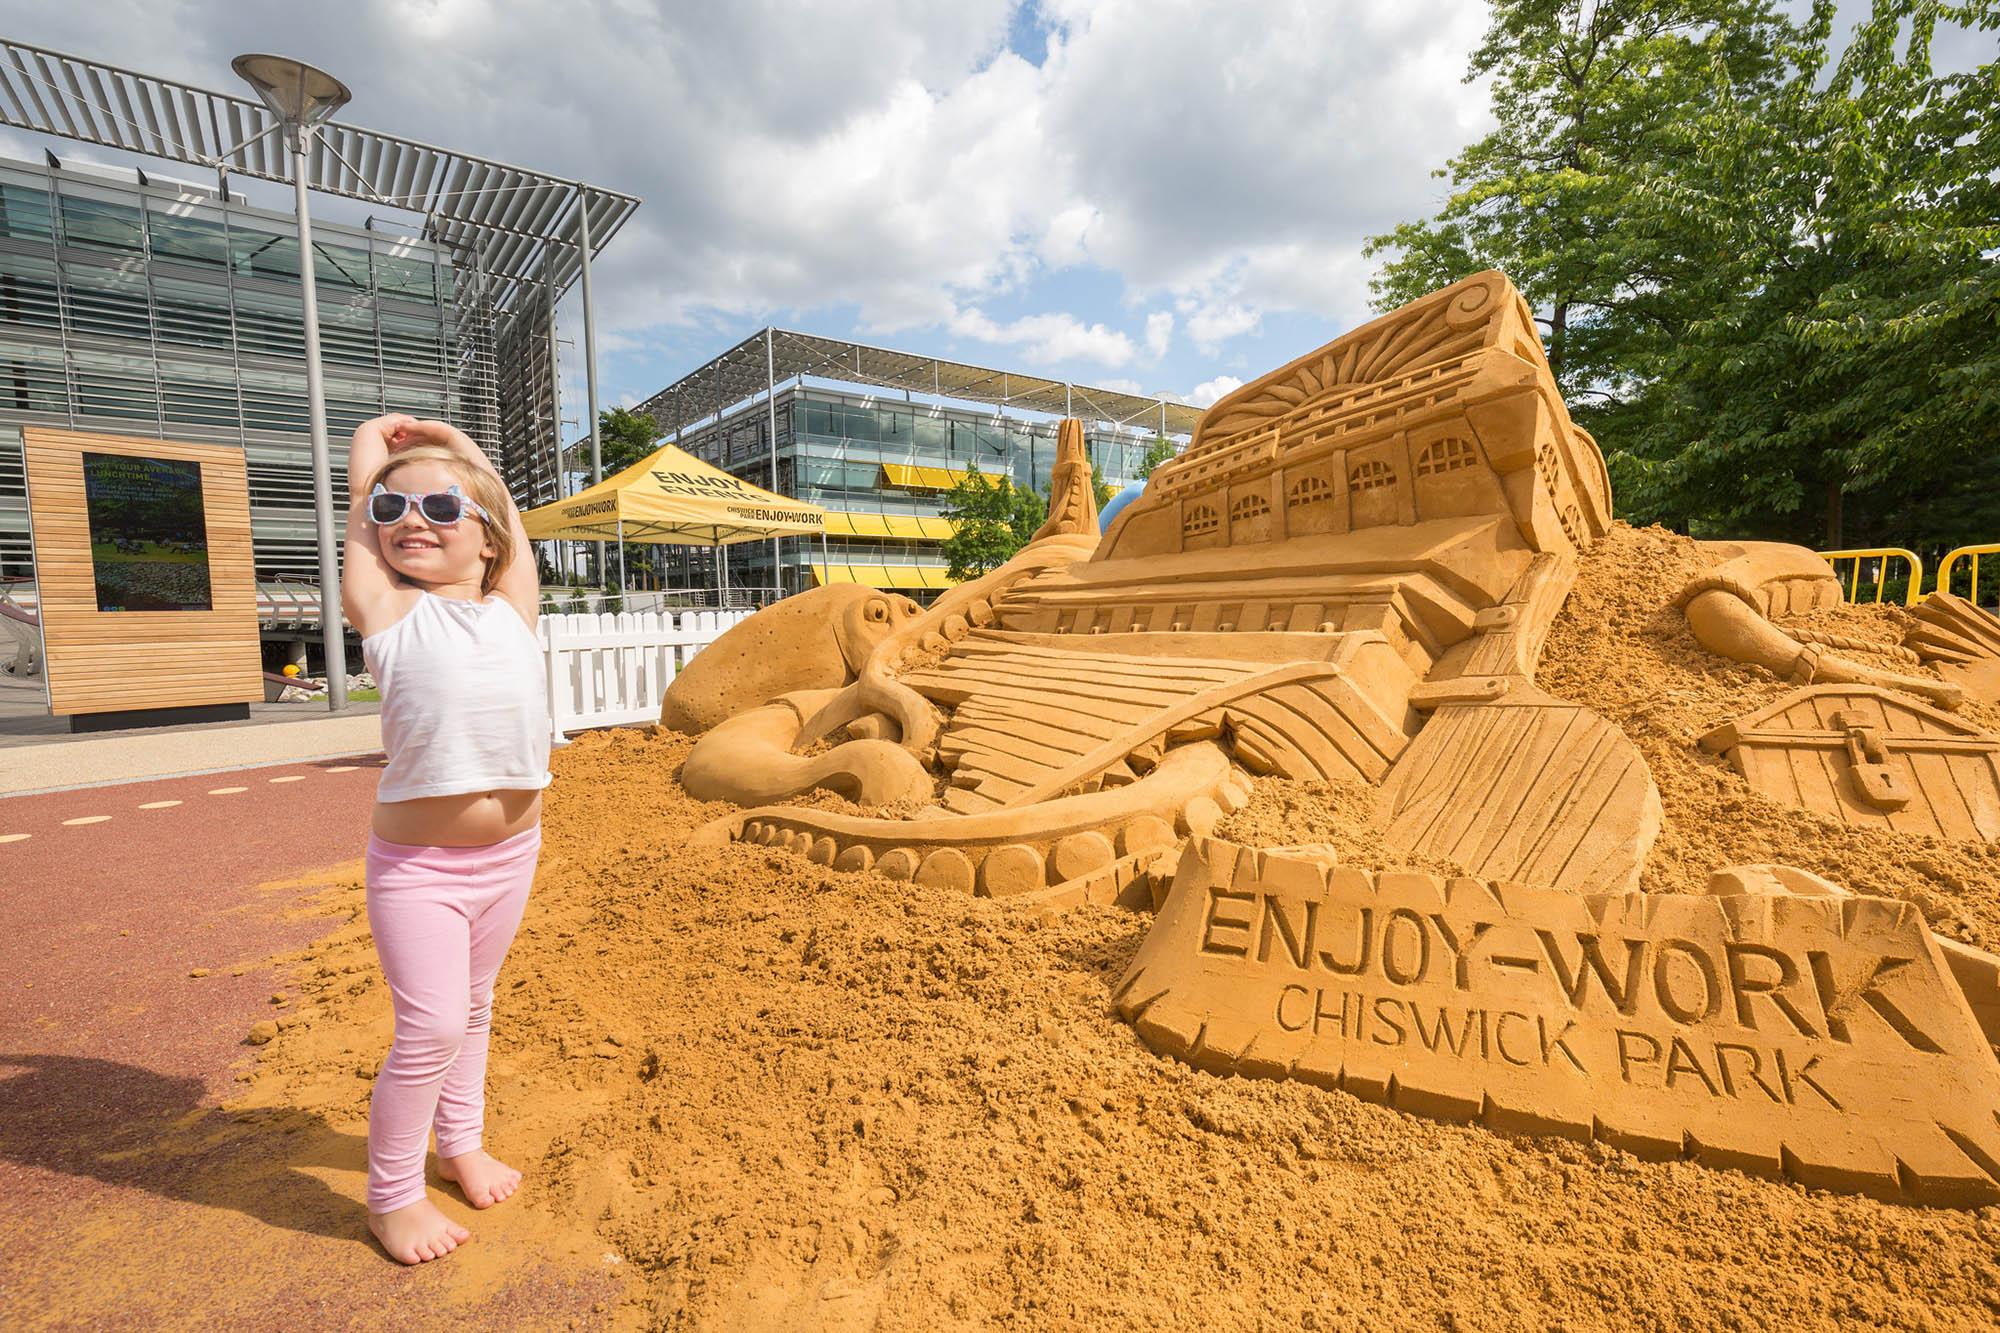 33 Sand sculpture